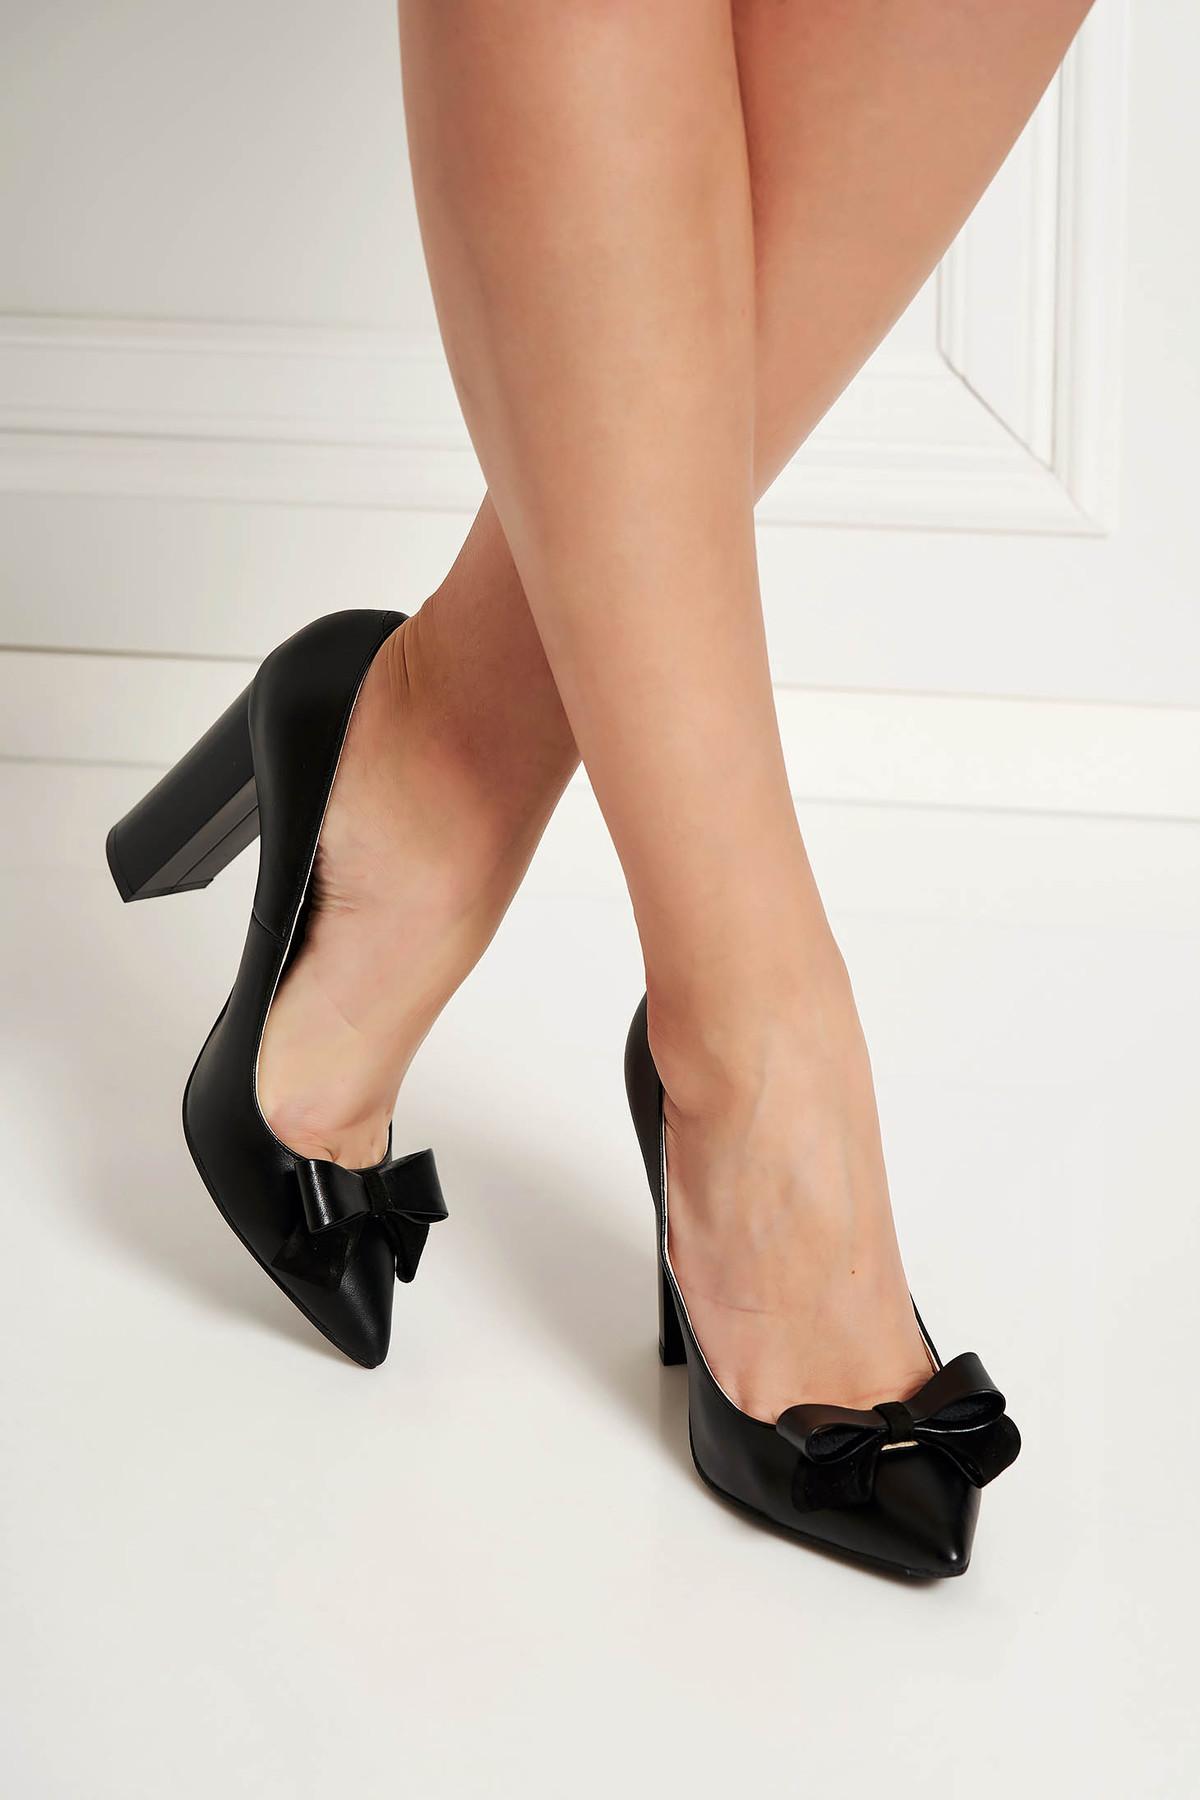 Pantofi negri office din piele naturala cu toc gros cu varful usor ascutit accesorizat cu o fundita